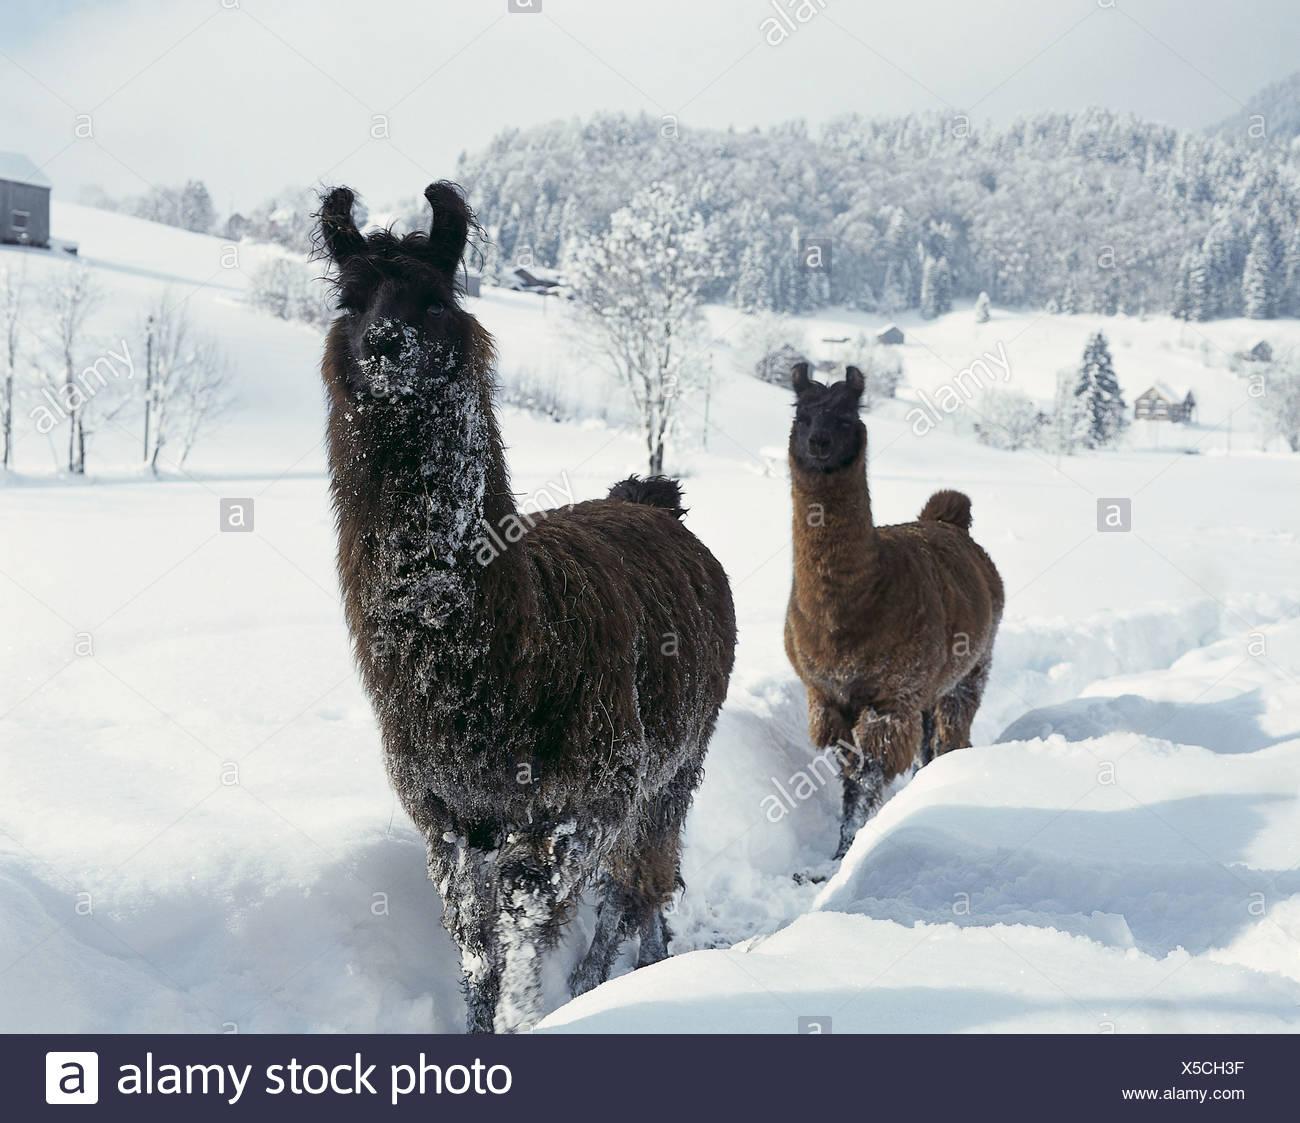 alpaca German silver canton St. Gallen llama lama snow Switzerland Europe animal beast animals beasts To - Stock Image